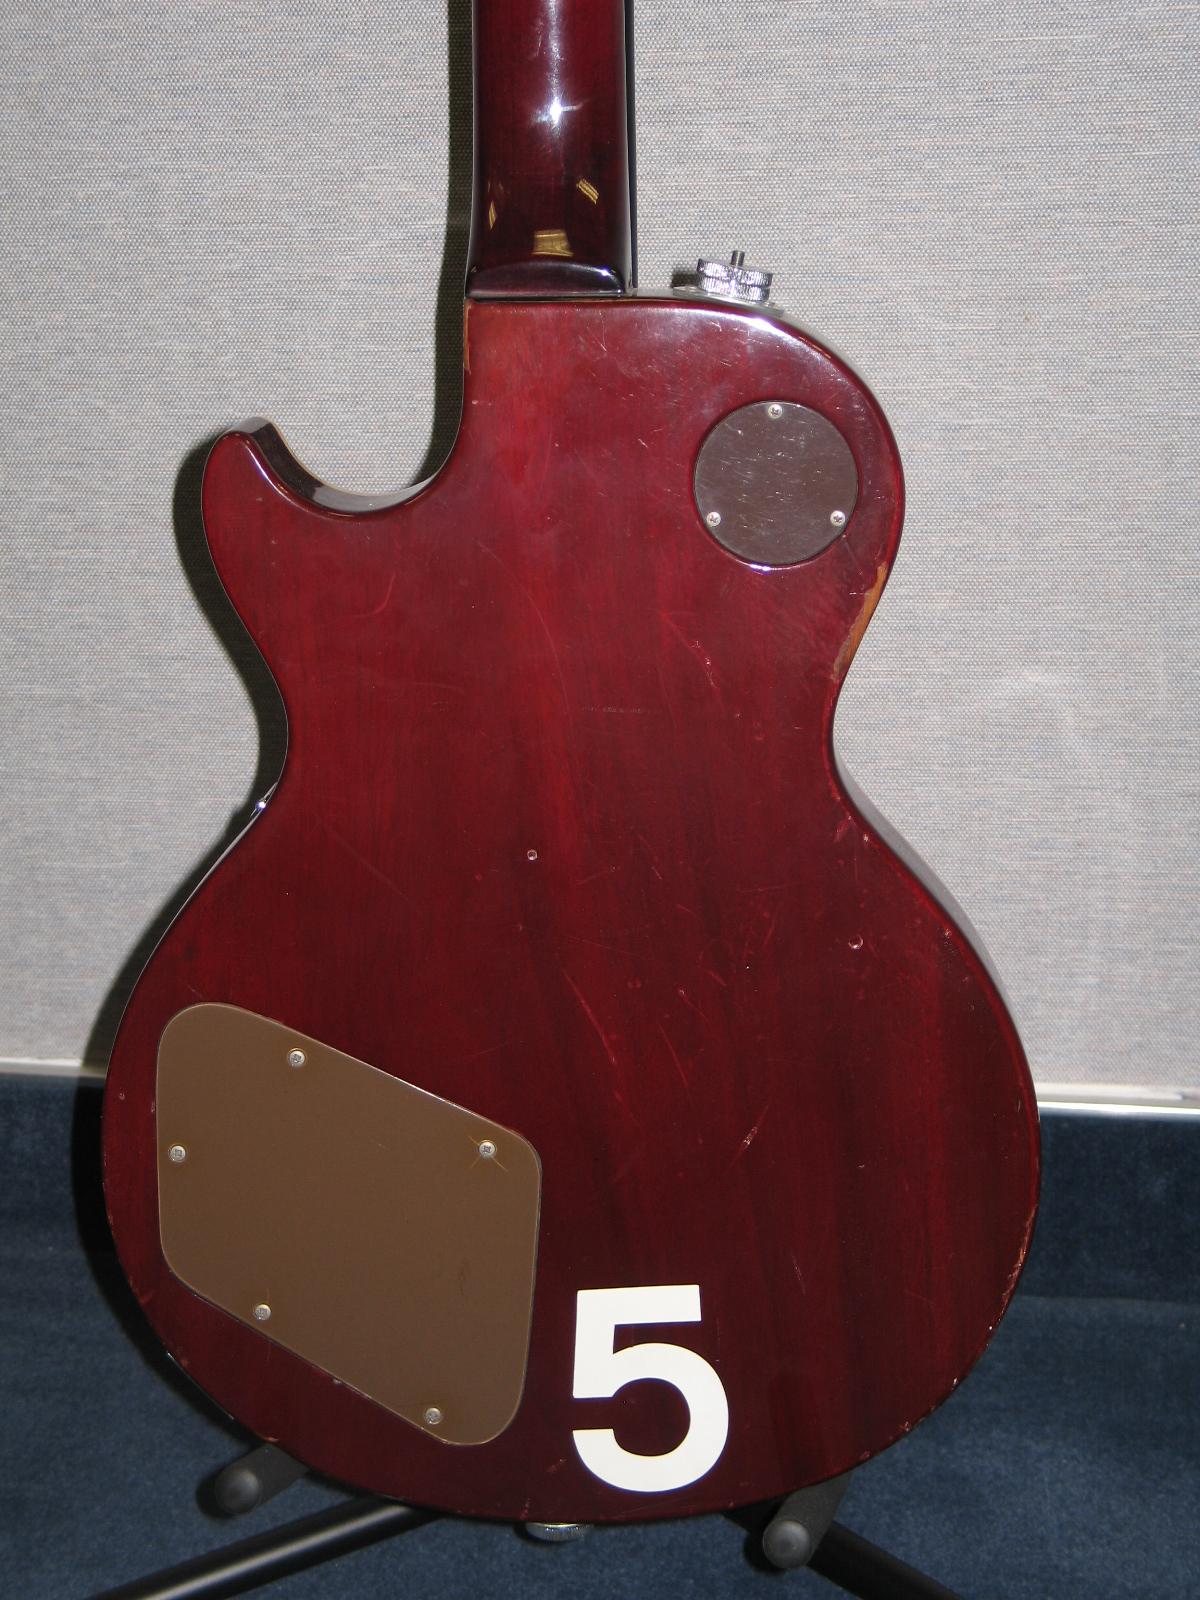 Pete's Guitars